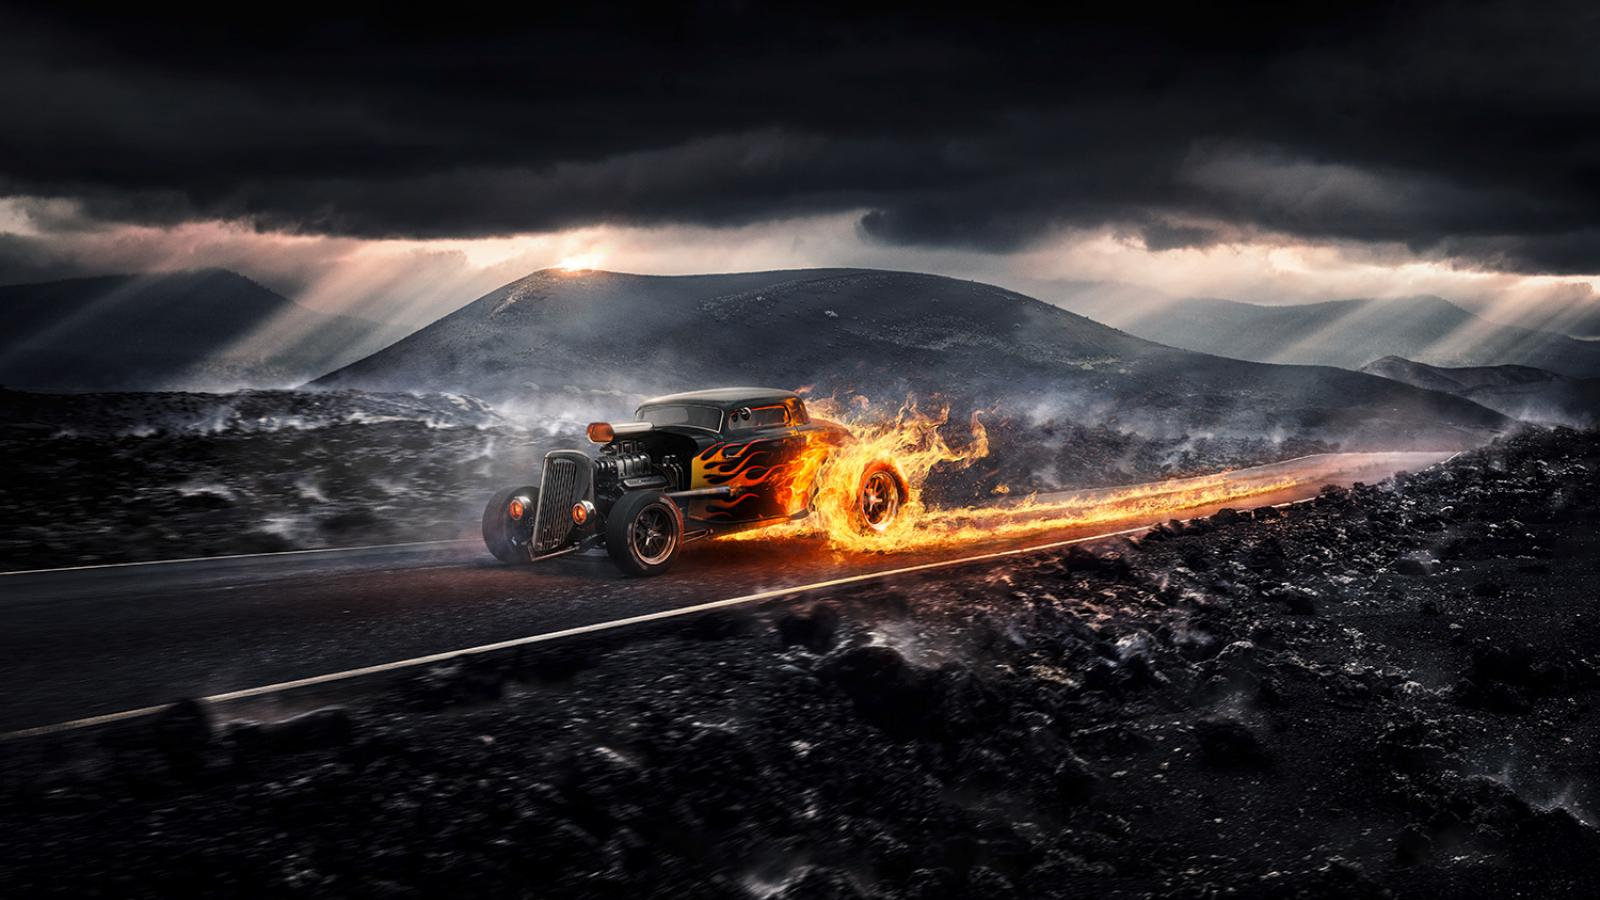 Digital Art in Photoshop: Drive it like its hot!